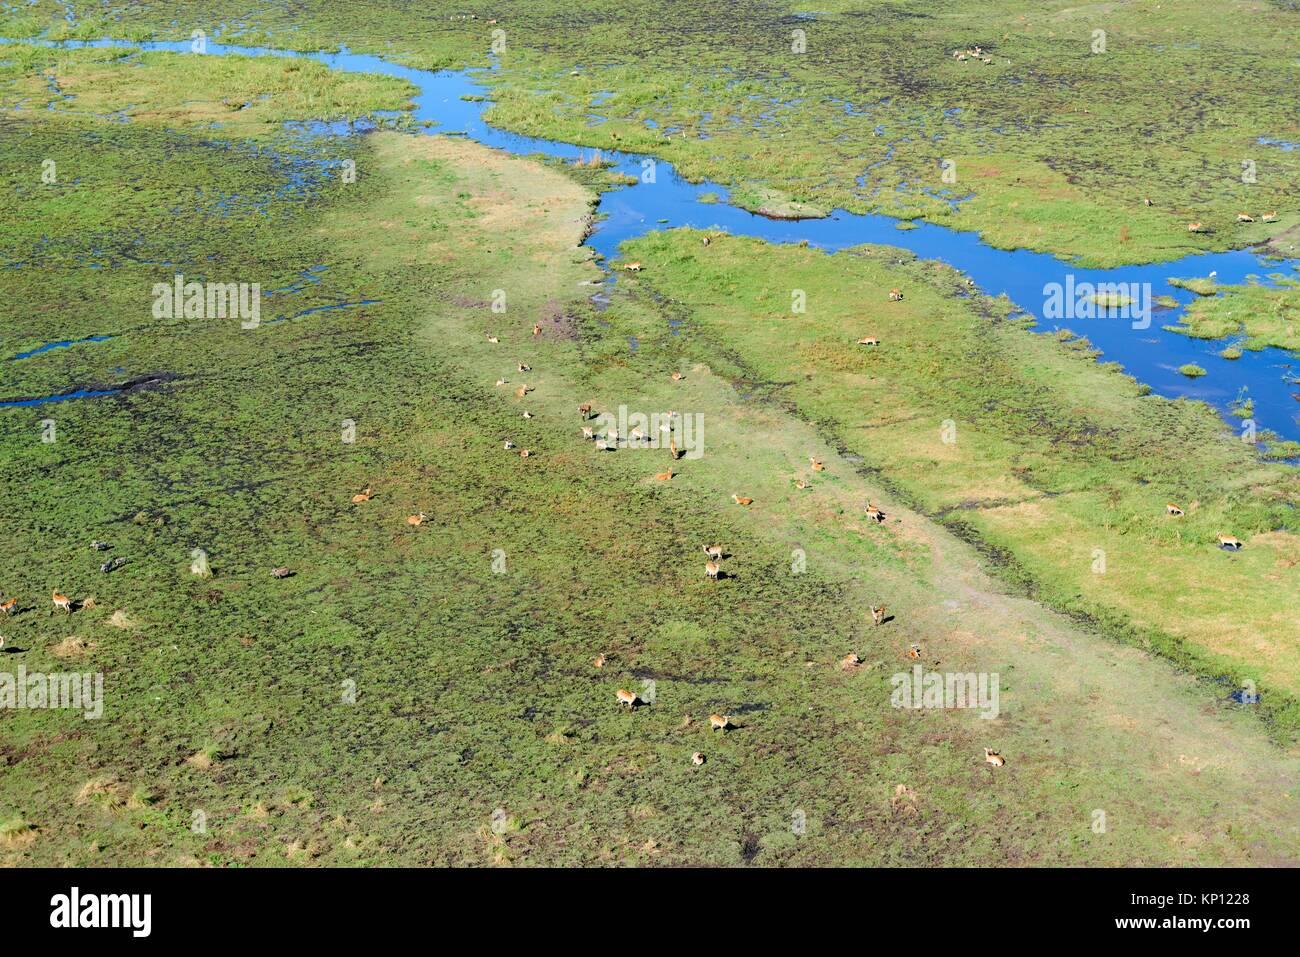 Aerial view of Lechwe (Kobus leche) in the swamp, Okavango Delta, Botswana. - Stock Image